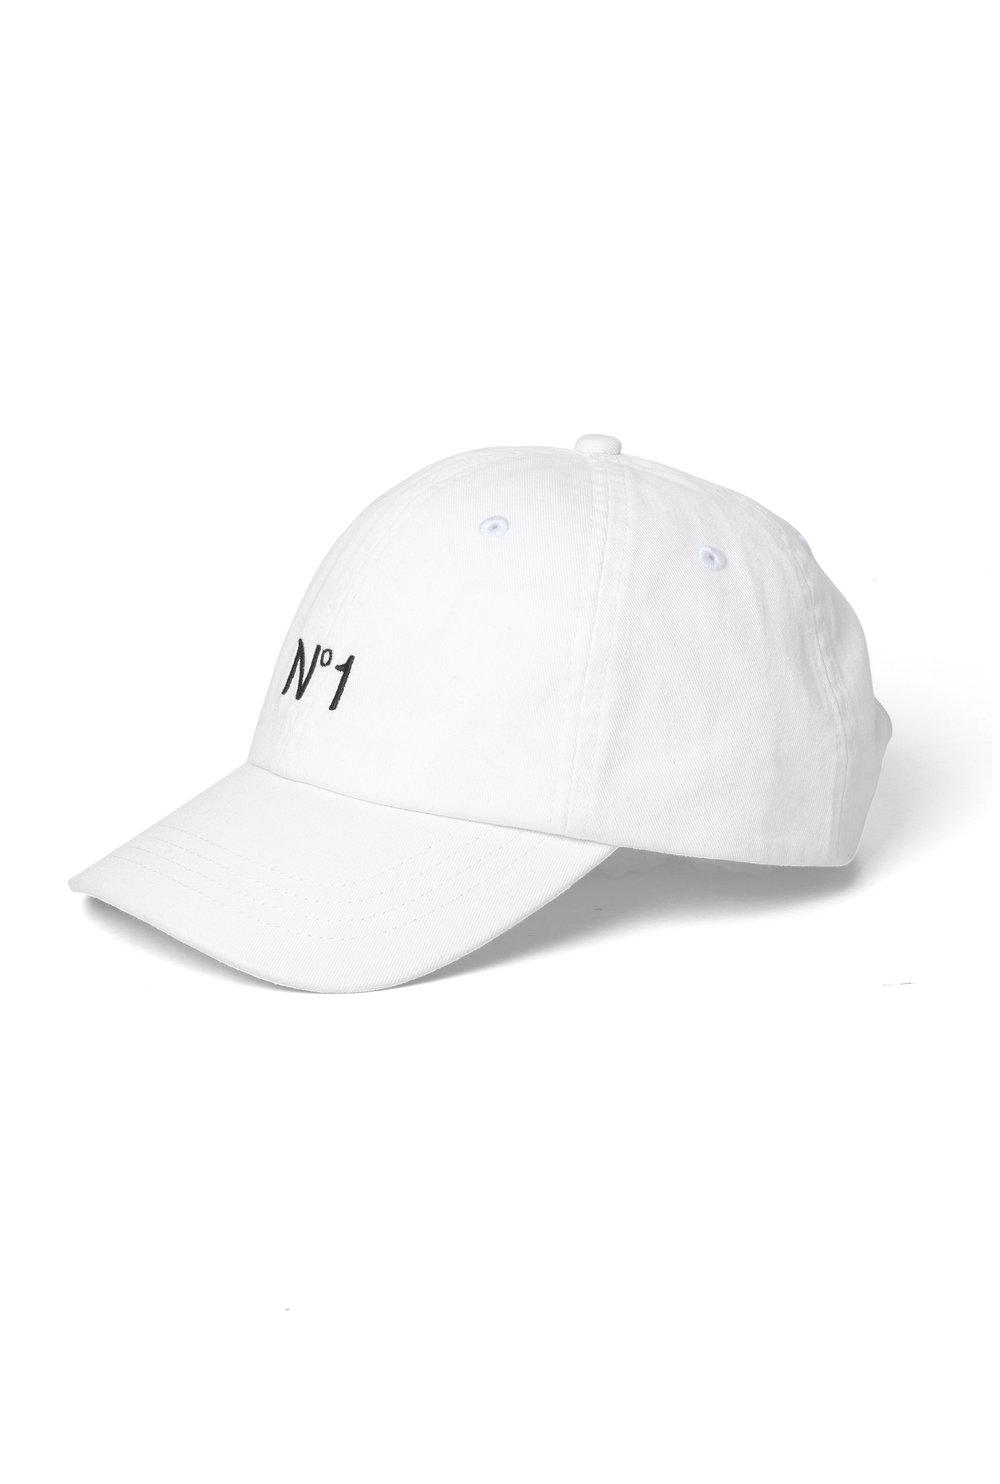 WoodWood_Low profile cap_White.jpg